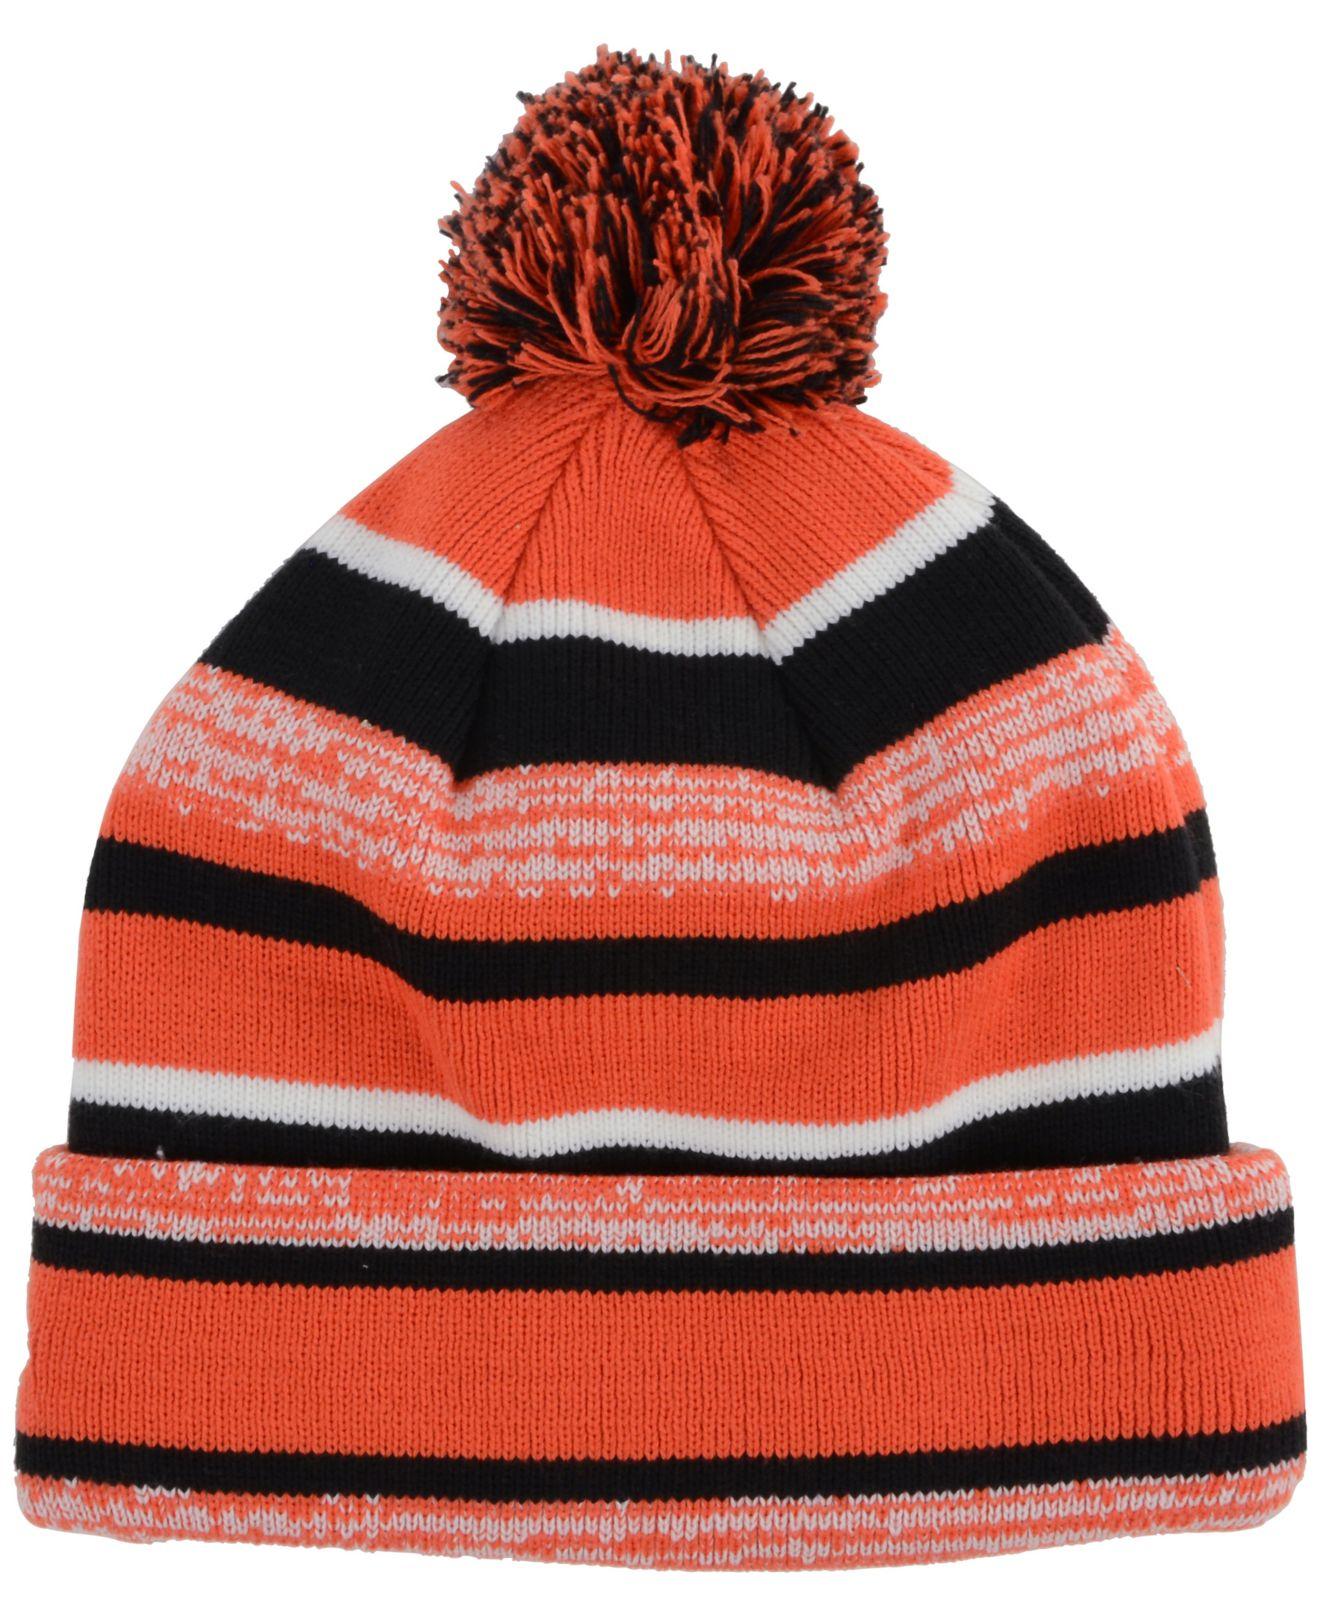 Lyst - KTZ Oklahoma State Cowboys Sport Knit Hat in Orange for Men 3d74900385a